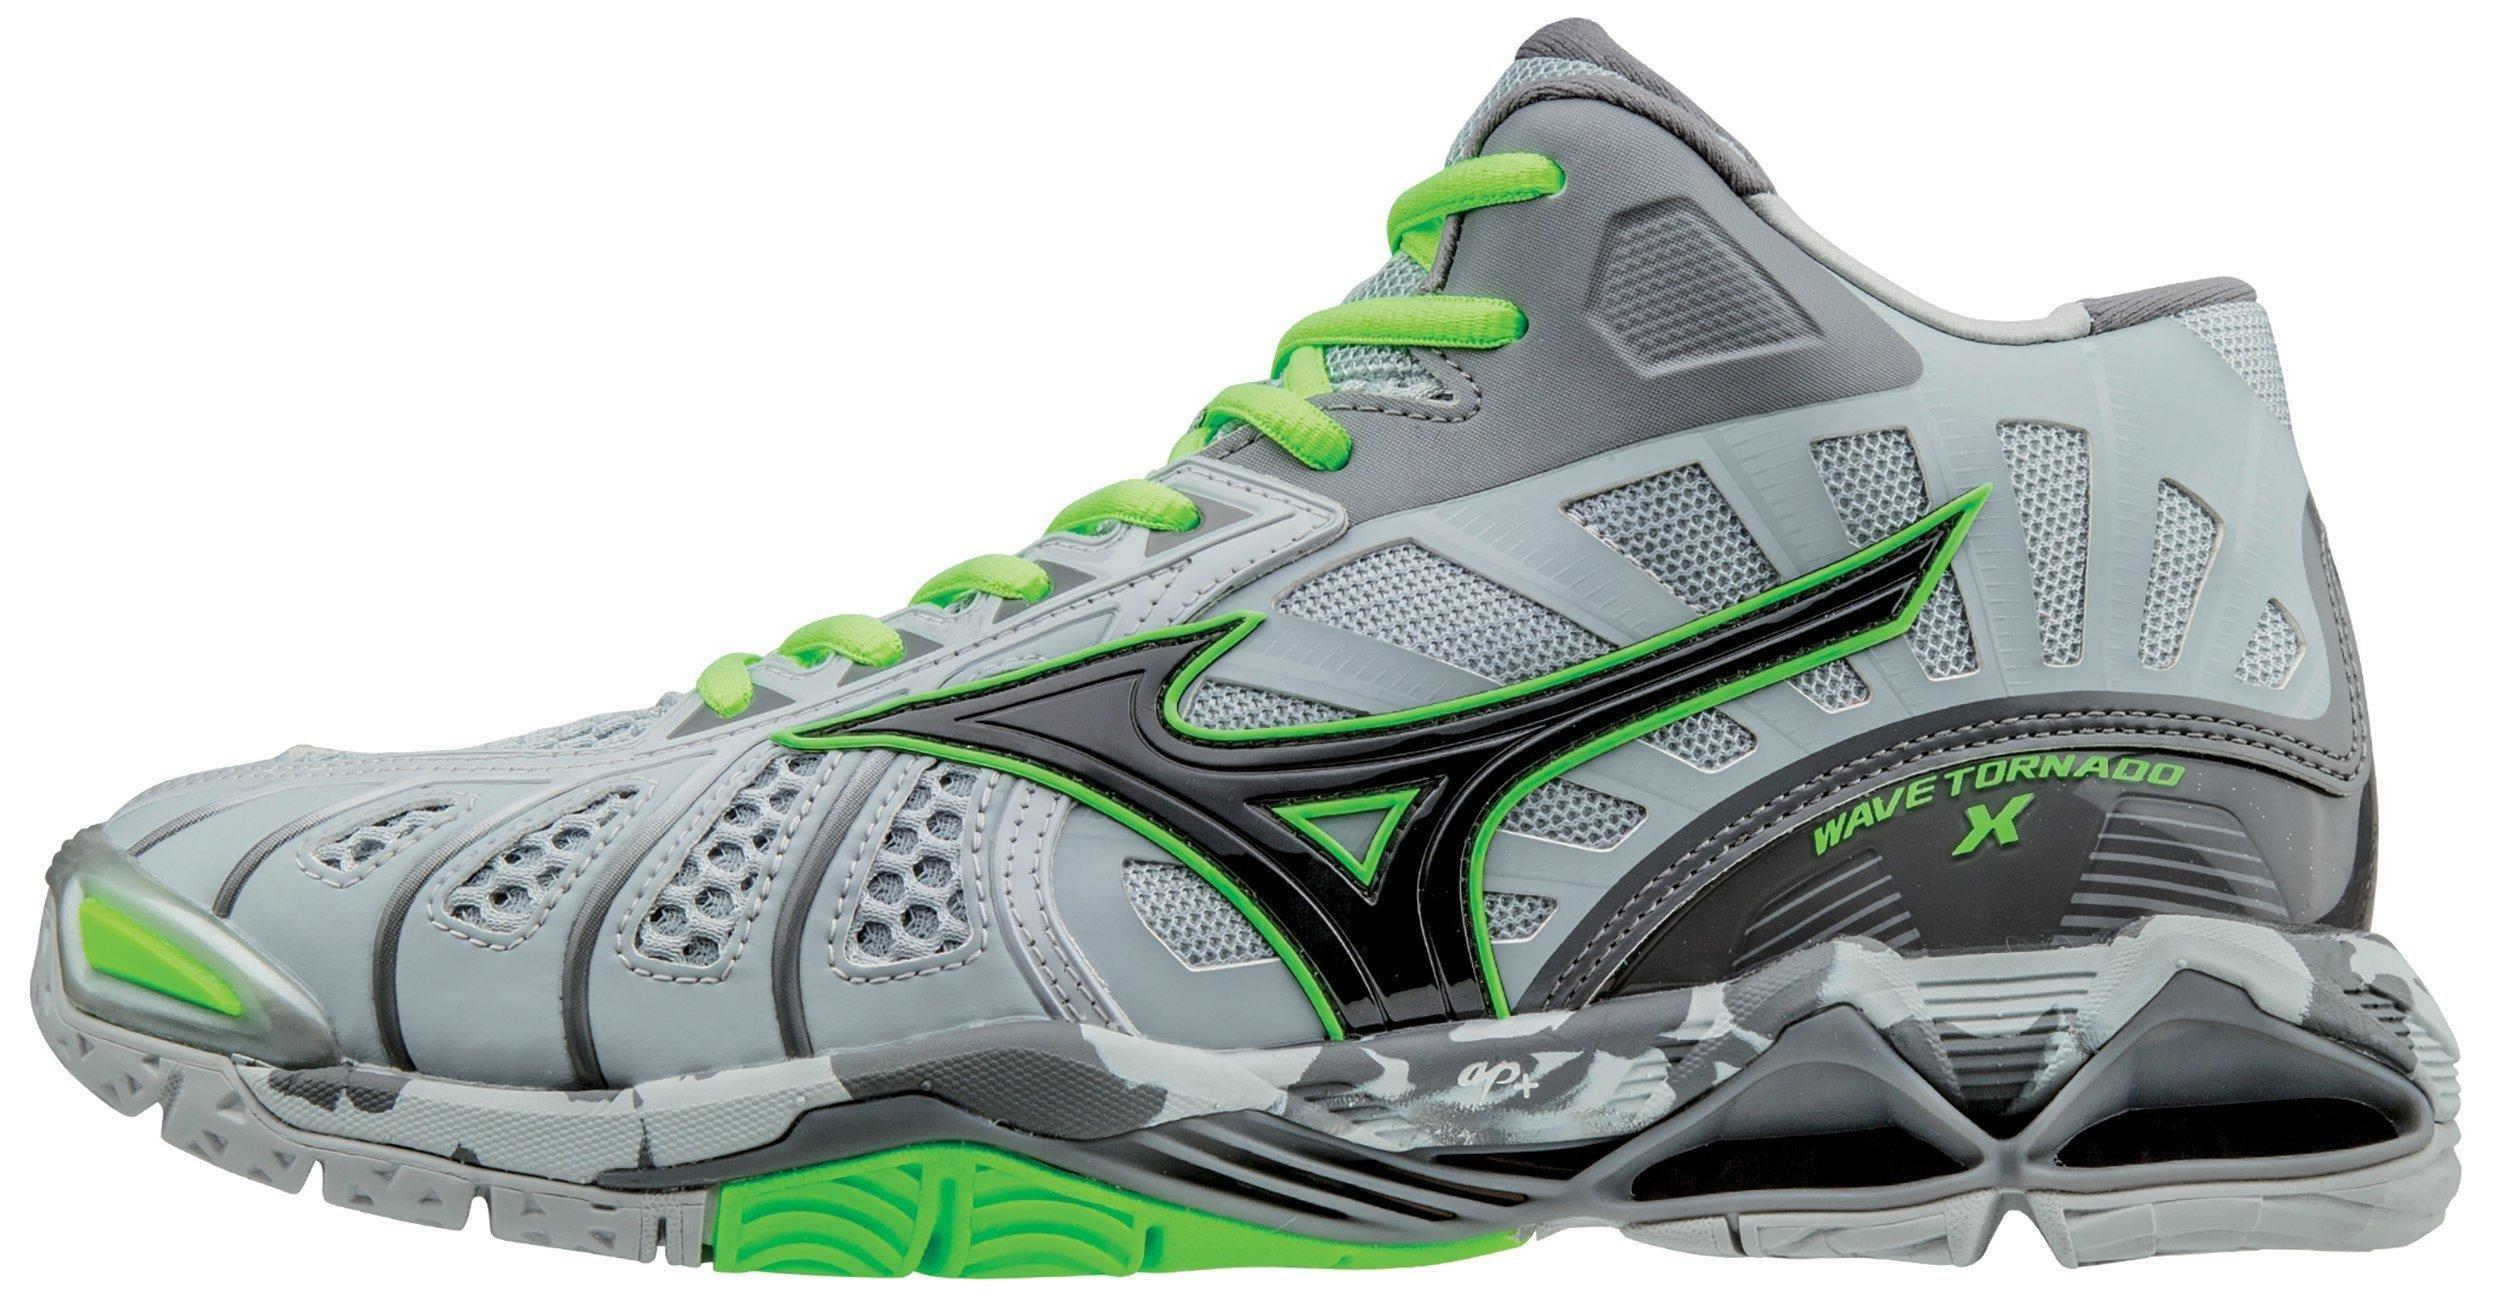 Mizuno Men's Wave Tornado X Mid Volleyball Shoe, Grey/Green Gecko, 16 D US